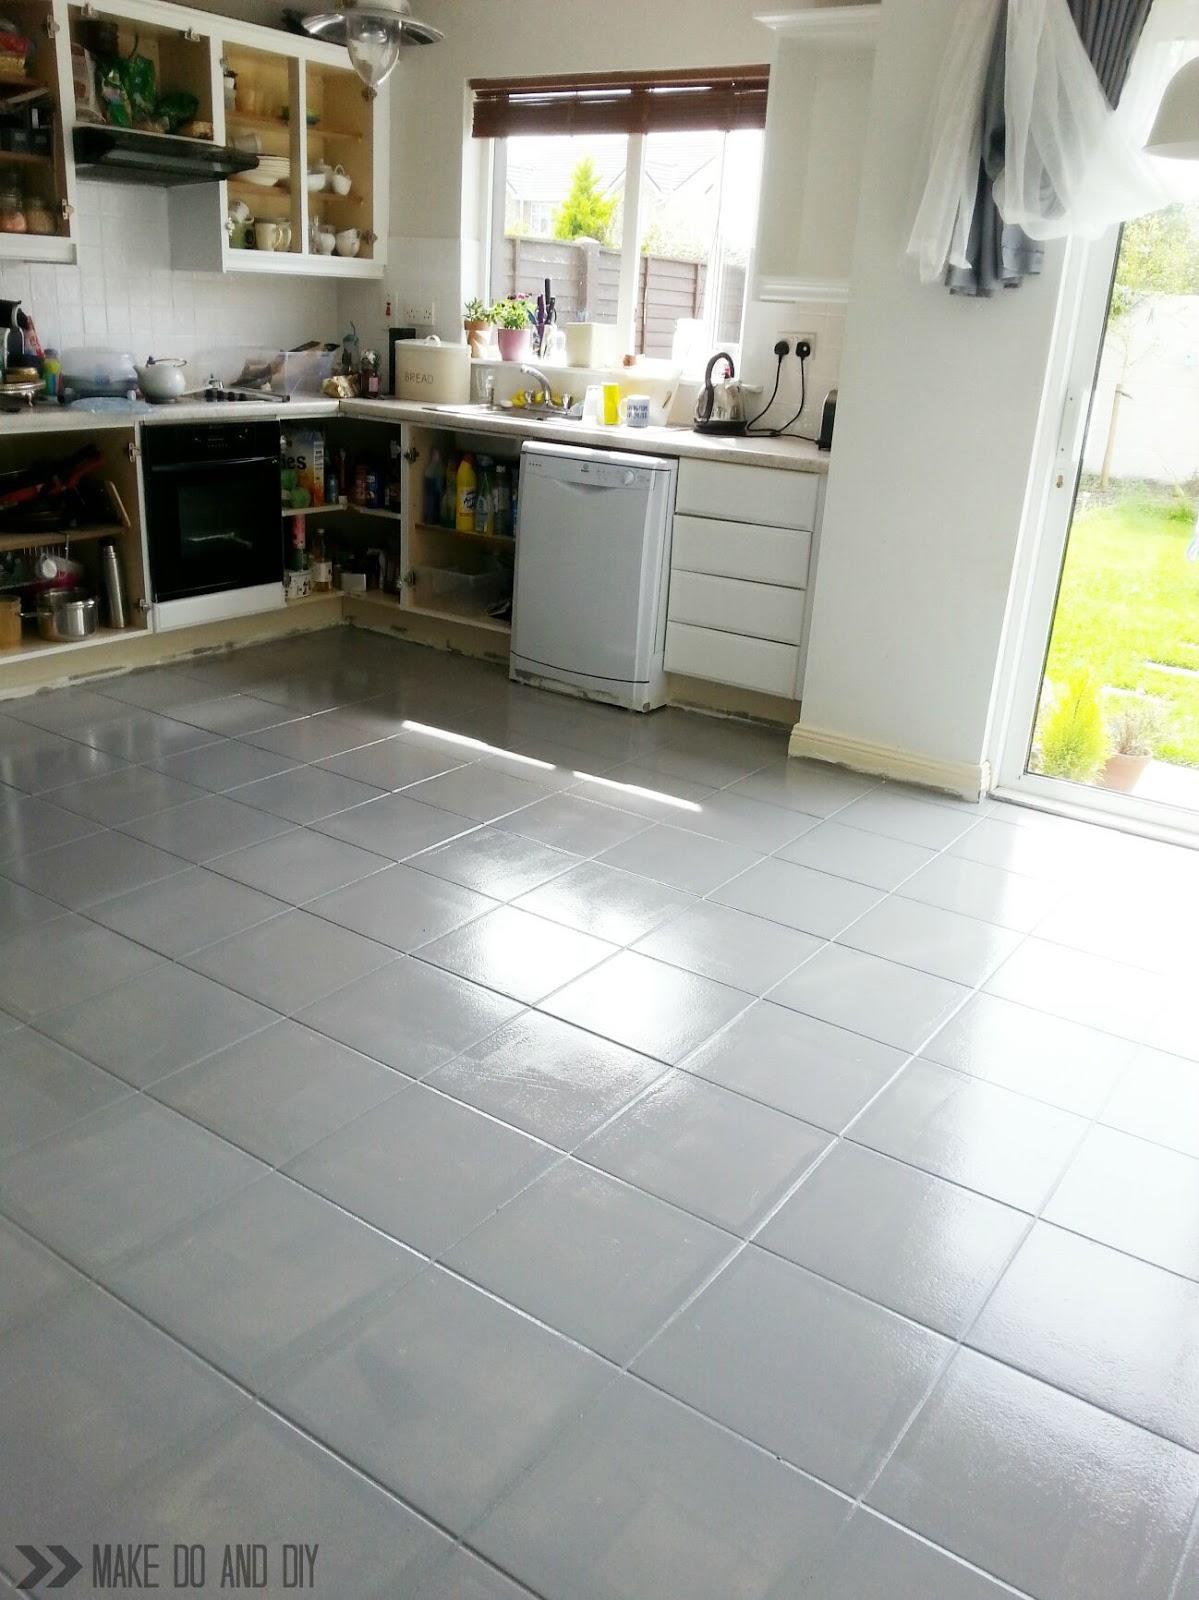 How To Paint Ceramic Tile Floor | Tile Design Ideas